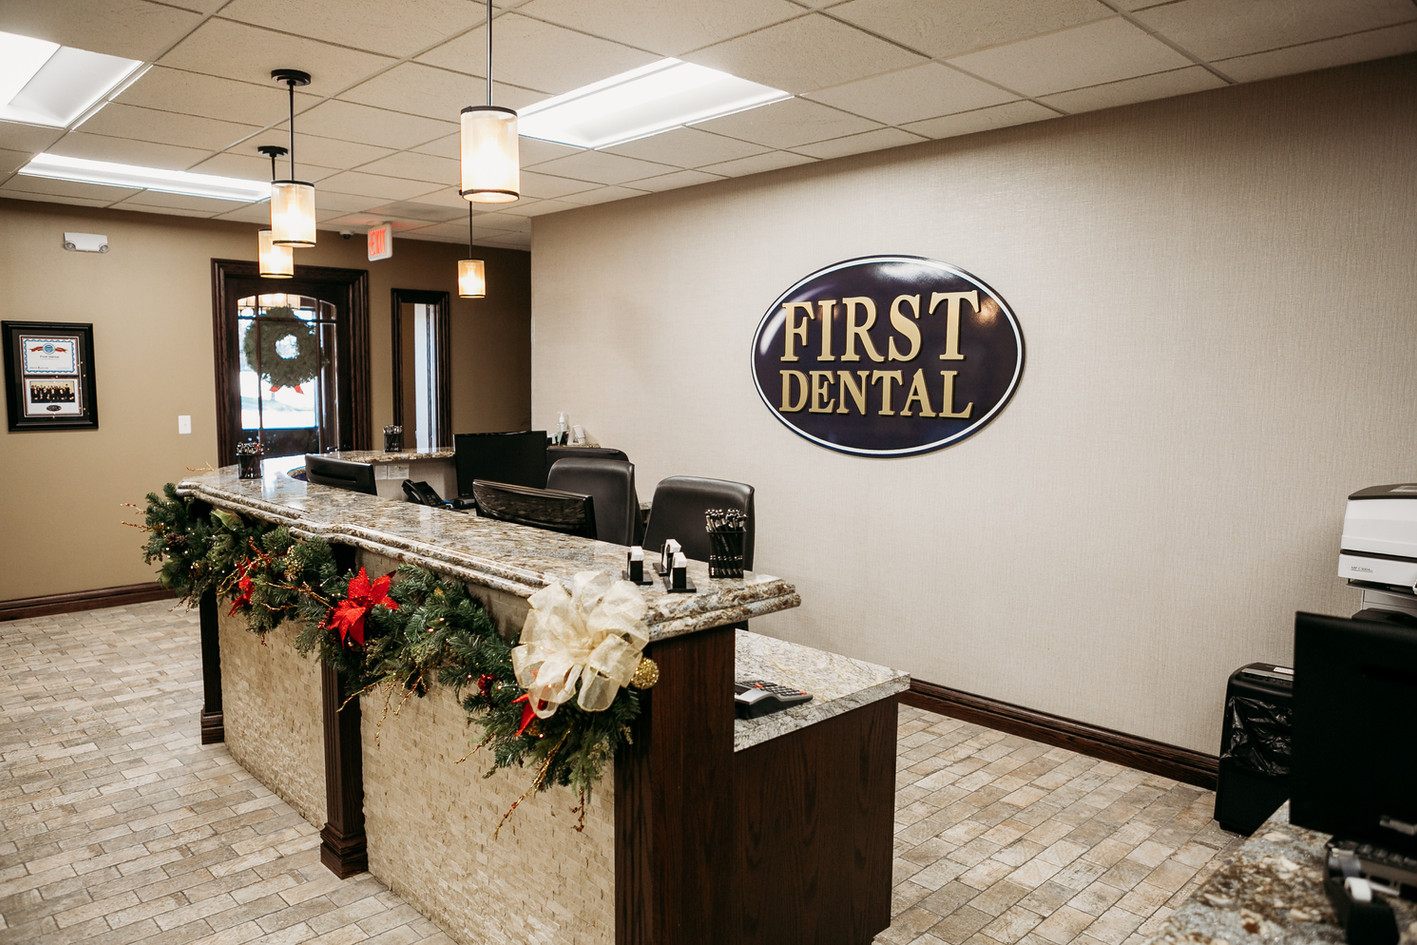 First Dental: Reception